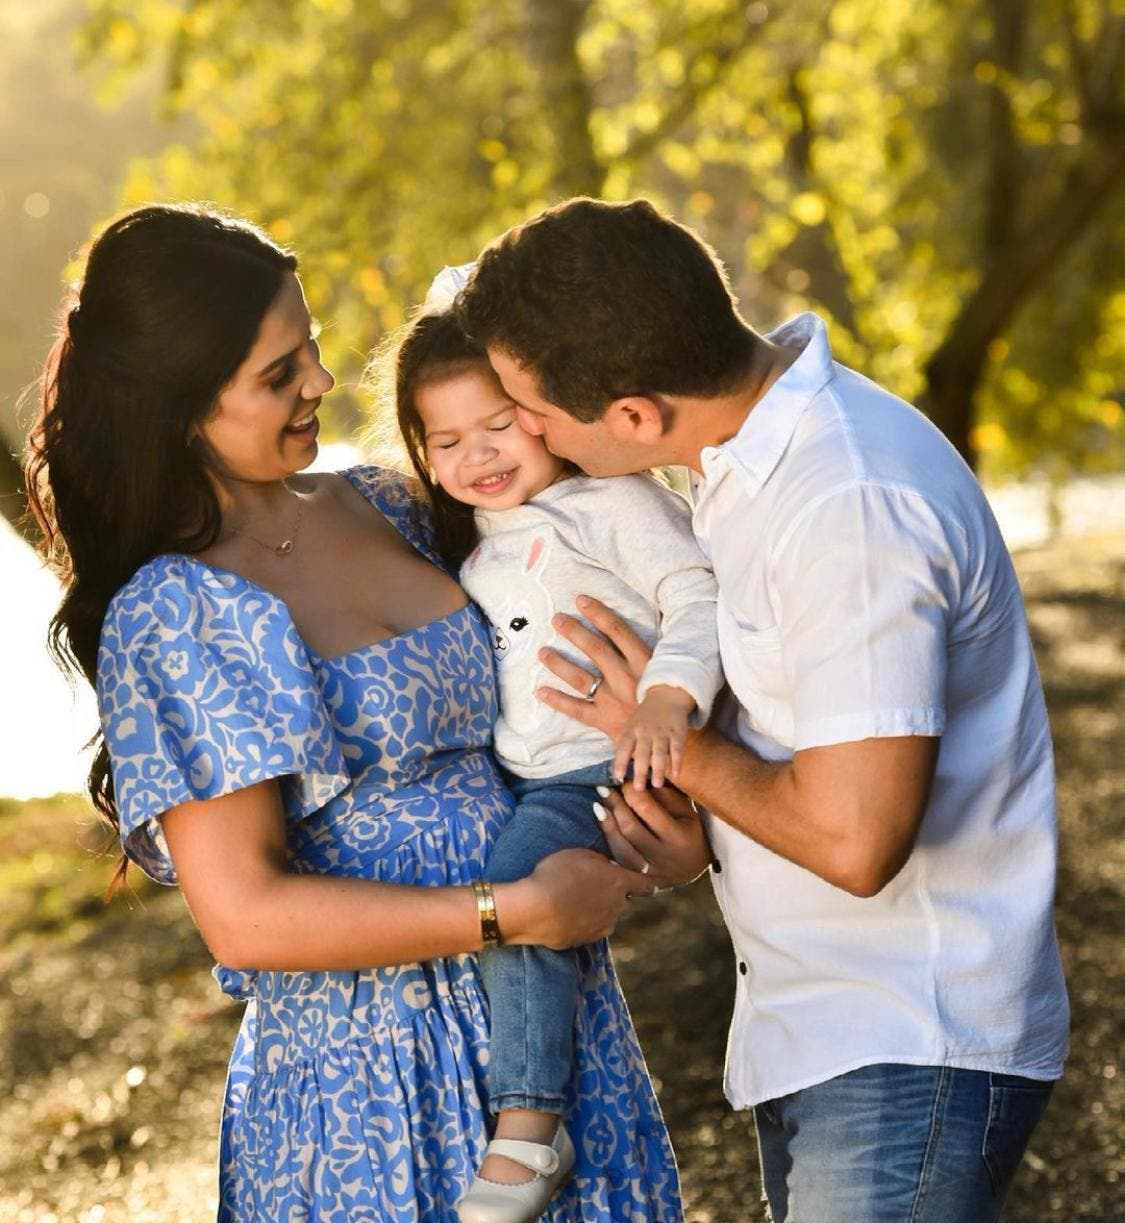 Yubelkis Peralta será madre por segunda vez con un varoncito